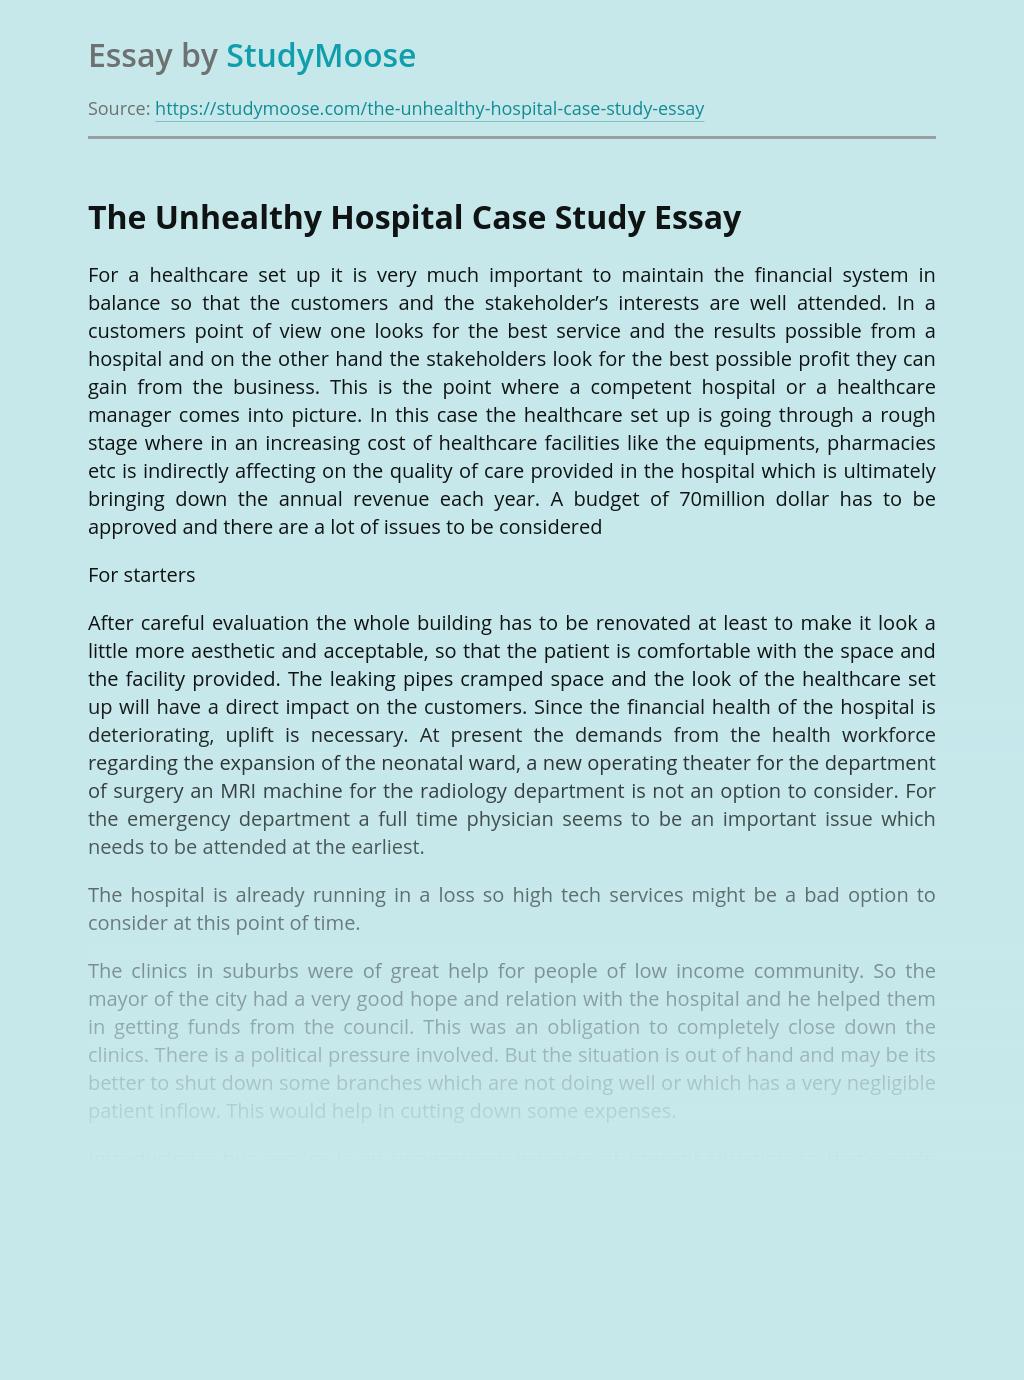 The Unhealthy Hospital Case Study